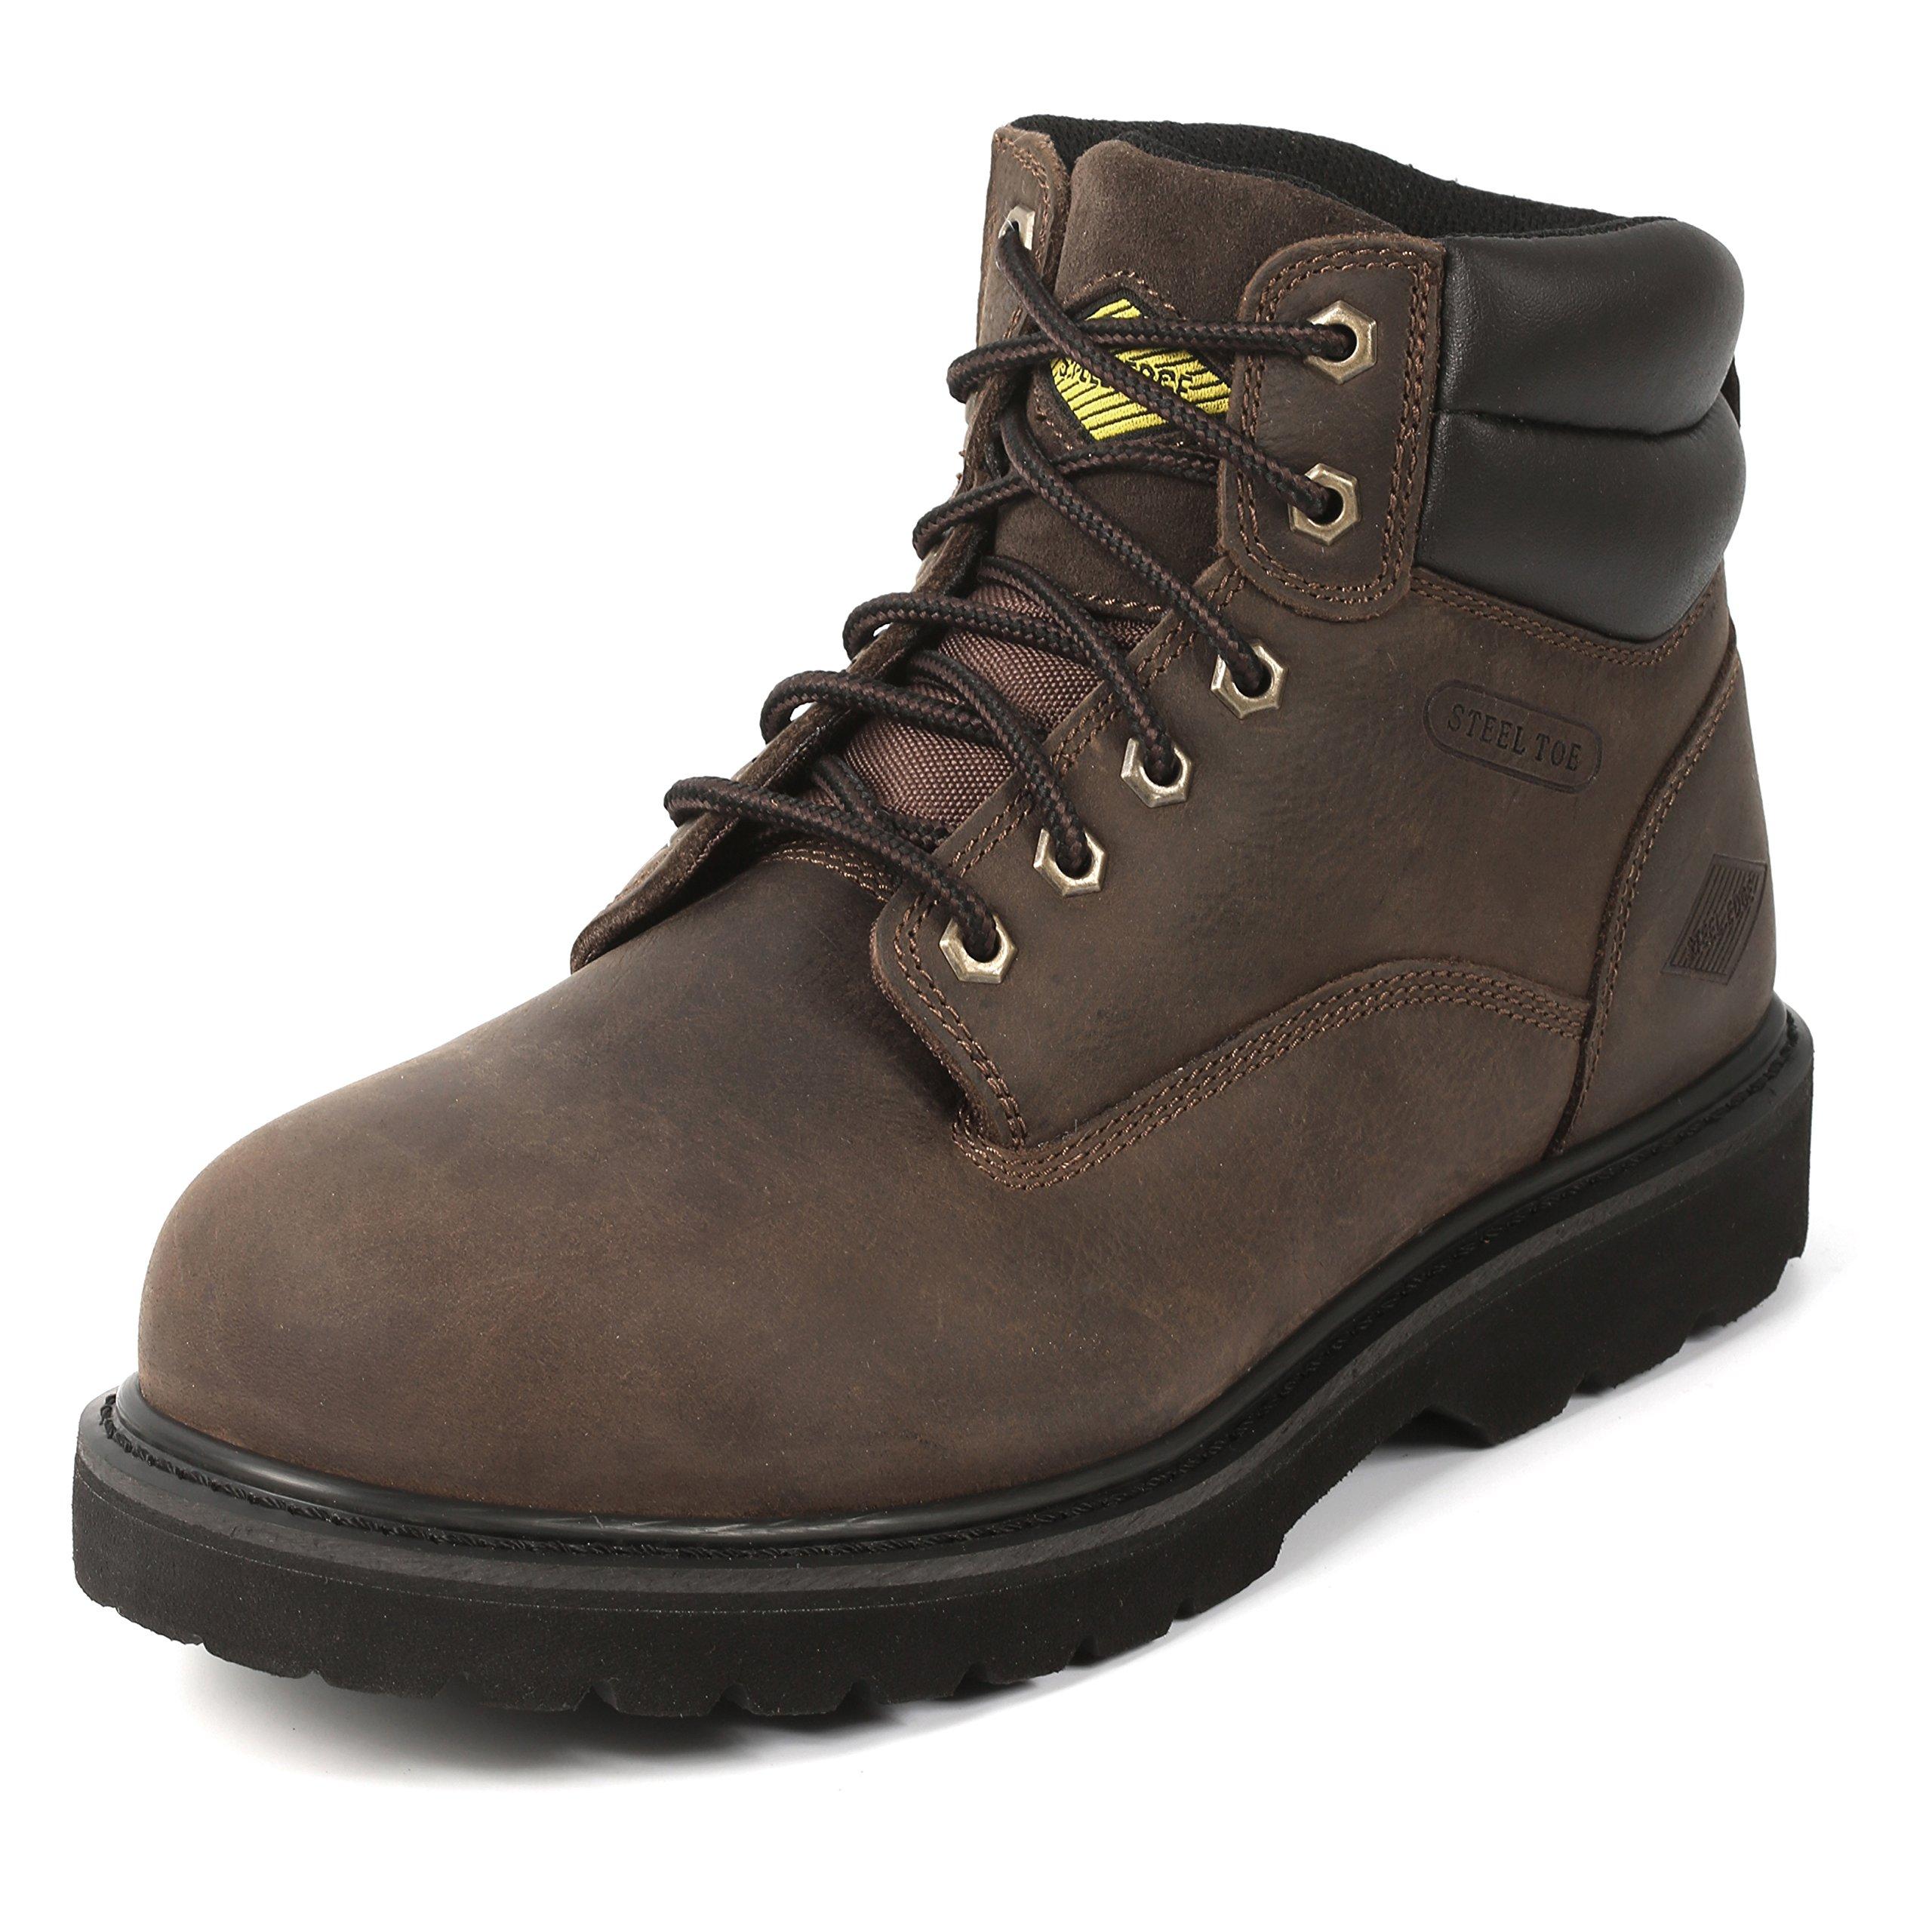 Steel Toe Work Boots for Men 6'' - Slip Resistant Composite Men's Safety Shoes (11.5) by Rockhard